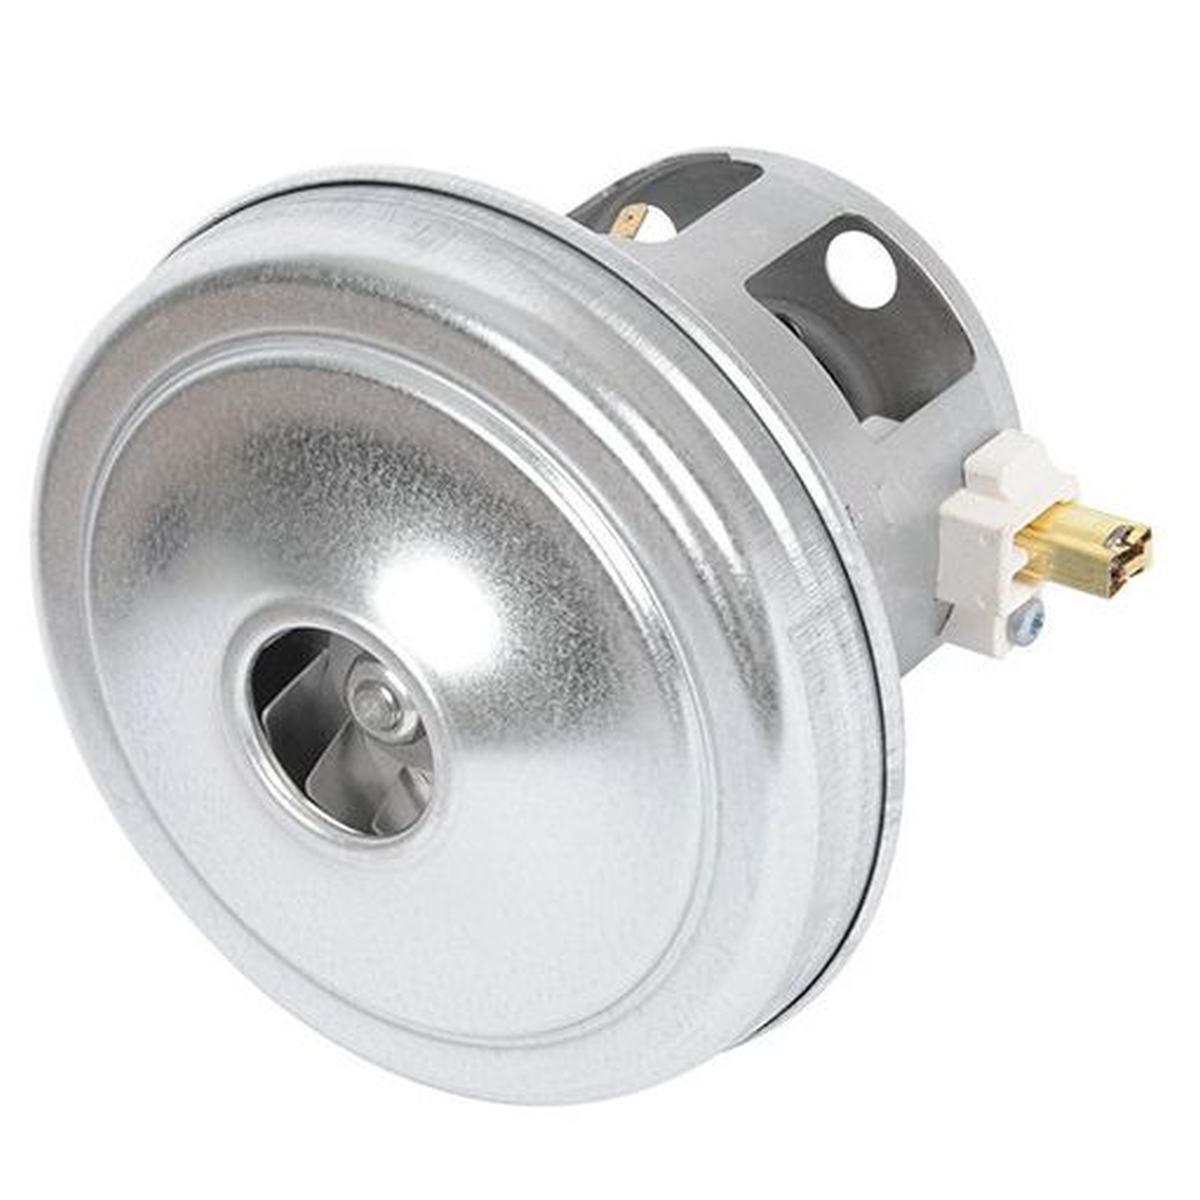 Støvsugermotor 1800W